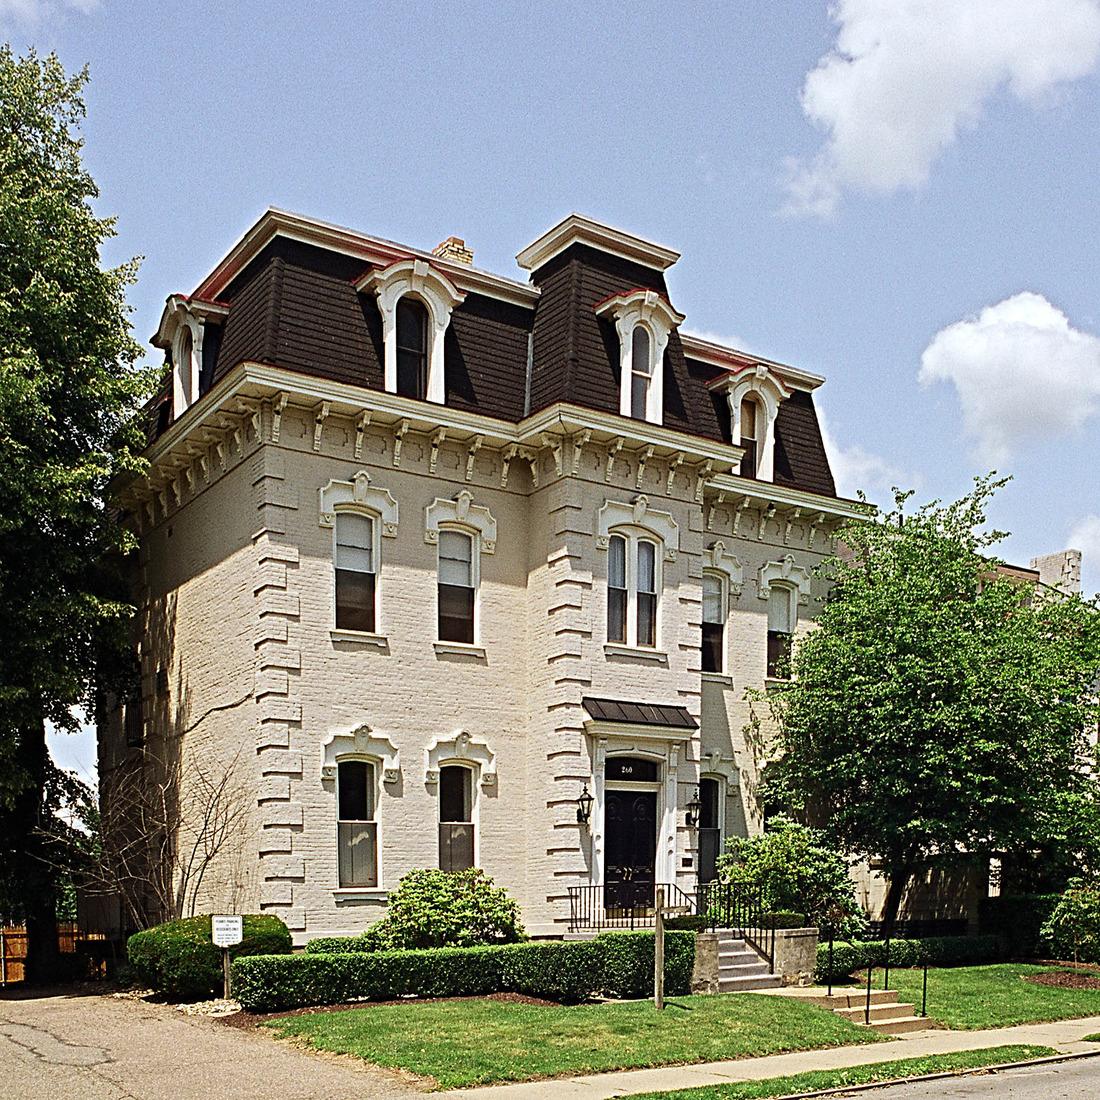 Shadyside Apartments: 260 Shady Avenue